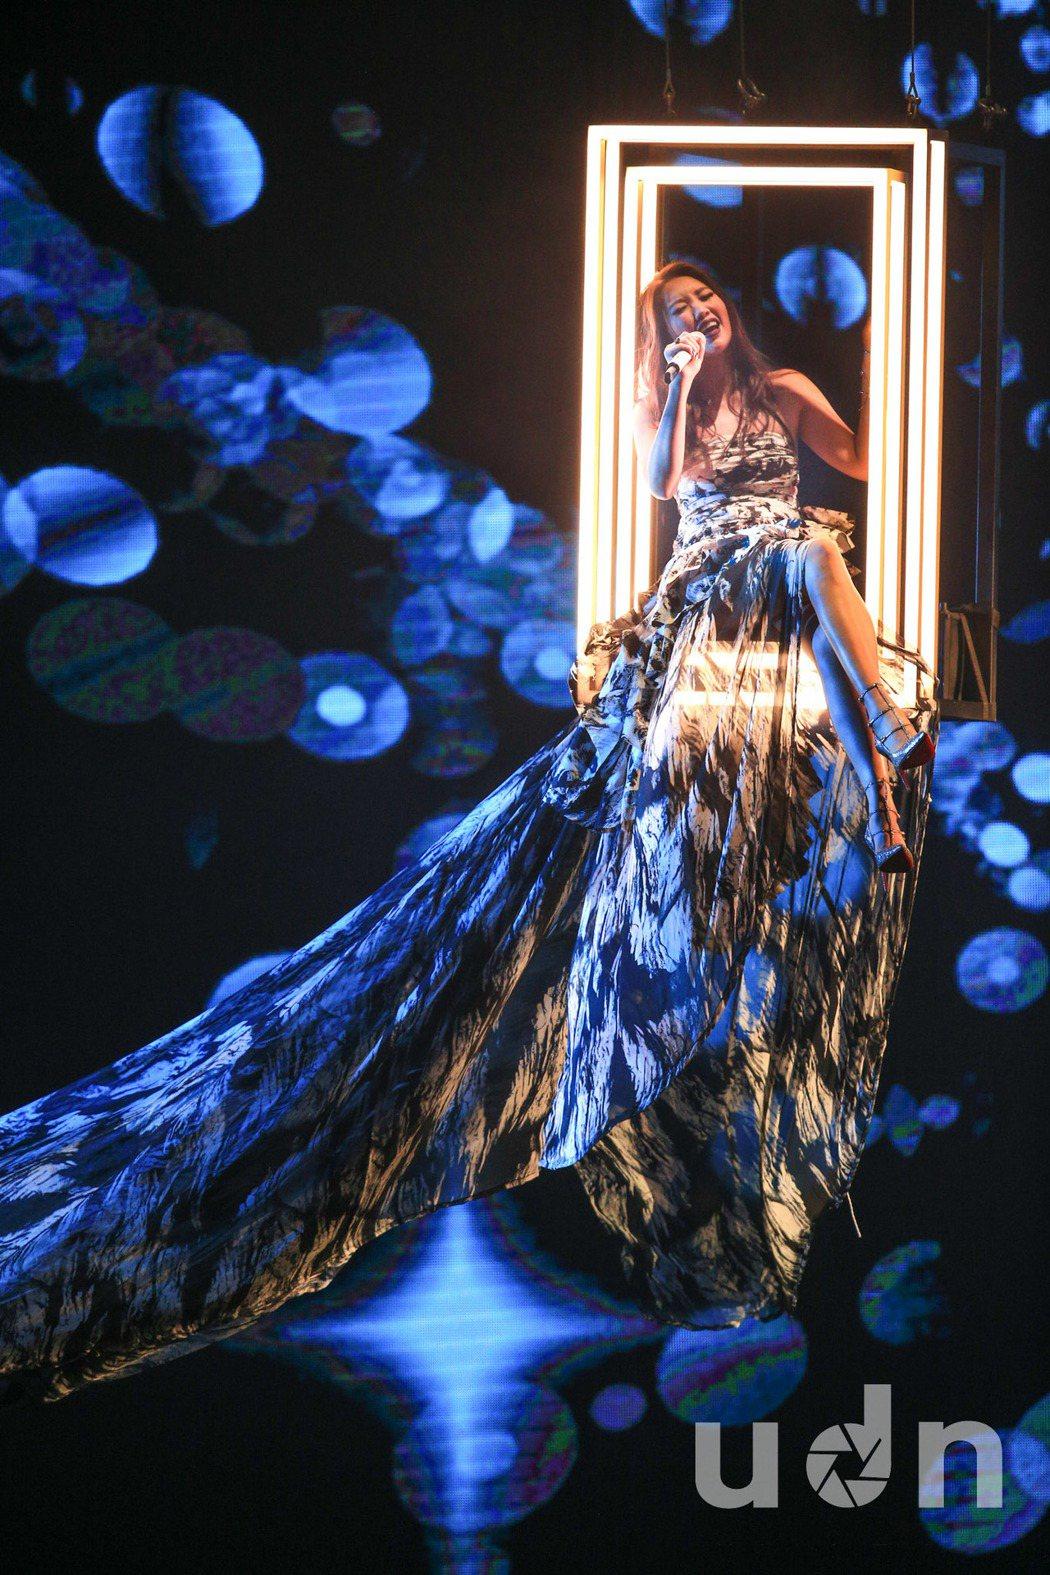 A-LIN25日擔任金曲獎頒獎典禮表演嘉賓,從天而降獻唱,畫面超夢幻。記者林伯東...